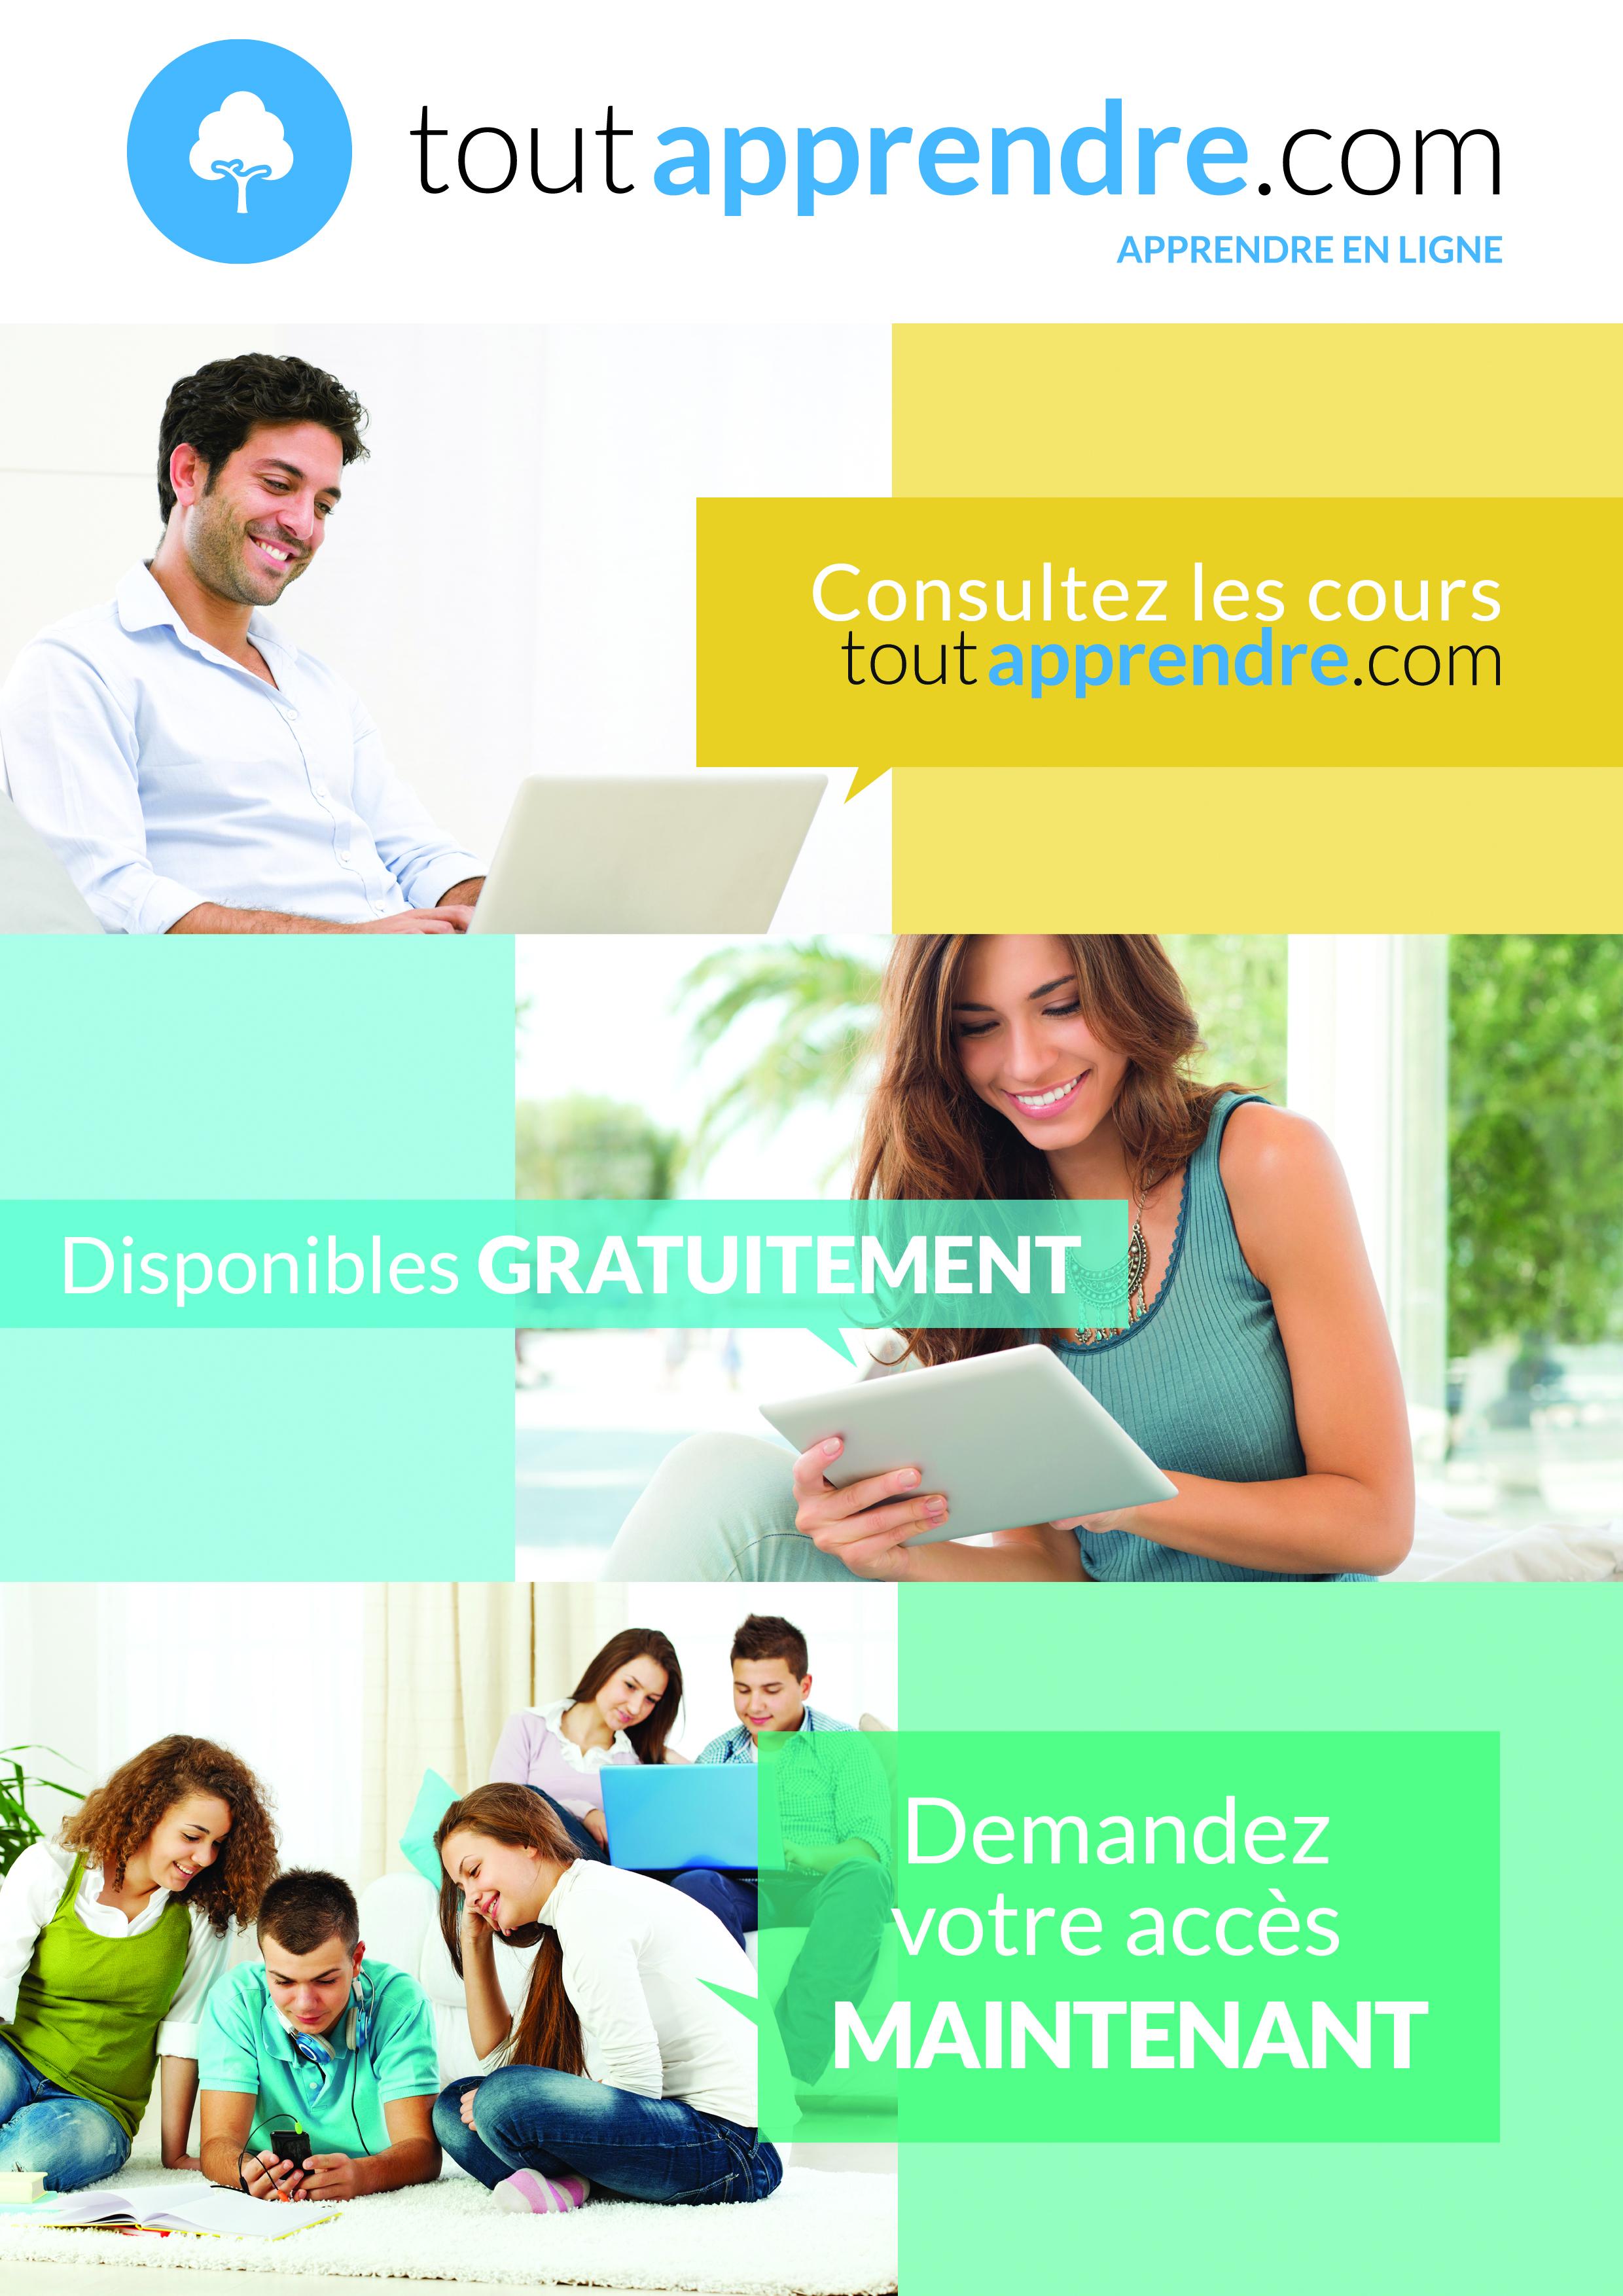 http://biblio.toutapprendre.com/ressources/v2/affiches/Affiche-TA-A4.jpg